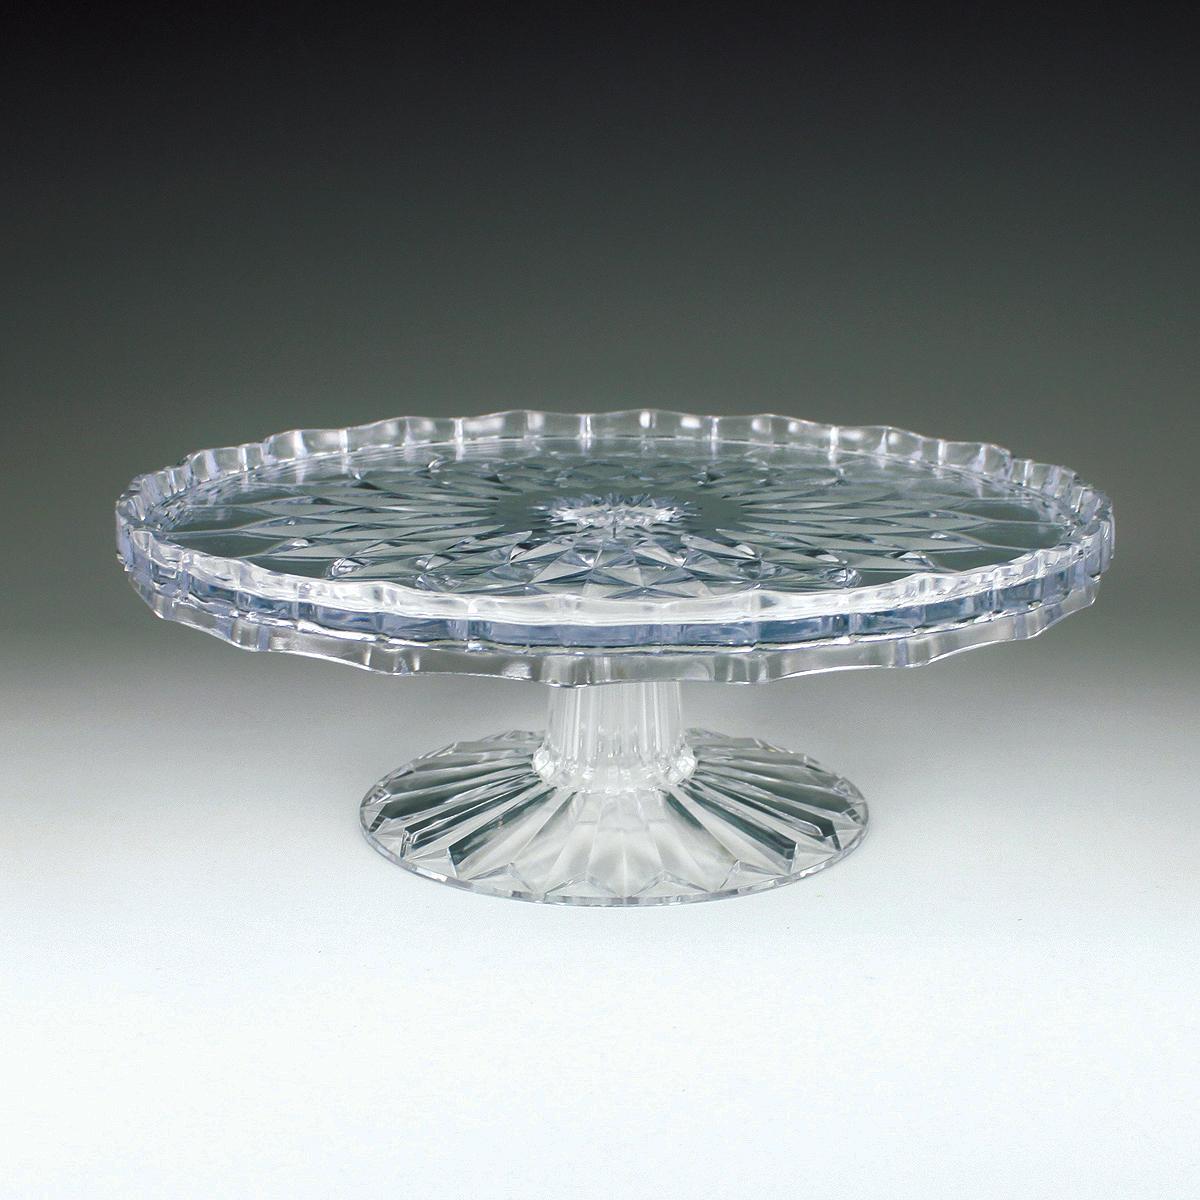 Crystalware Crystal Cut 10  Tiered Cake Plate & Crystalware Crystal Cut 10